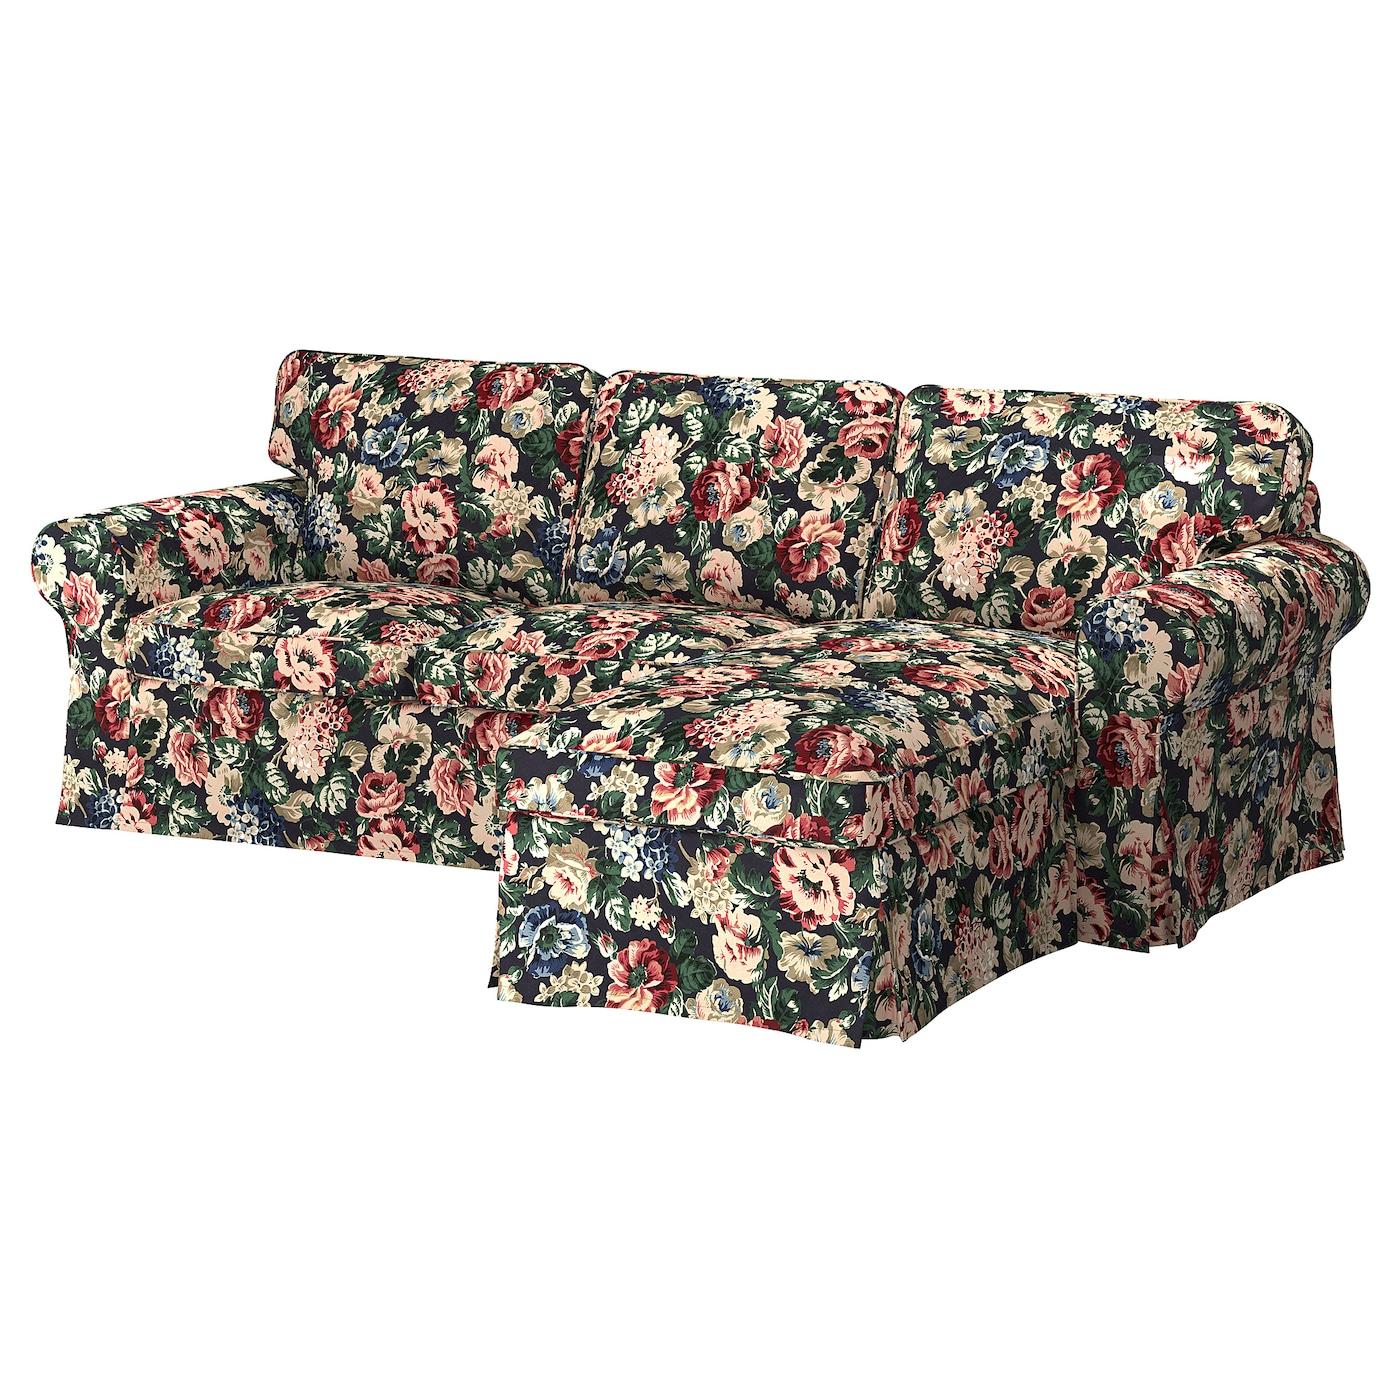 Divano Letto Ektorp Usato.Ektorp Divano A 3 Posti Con Chaise Longue Lingbo Fantasia Ikea